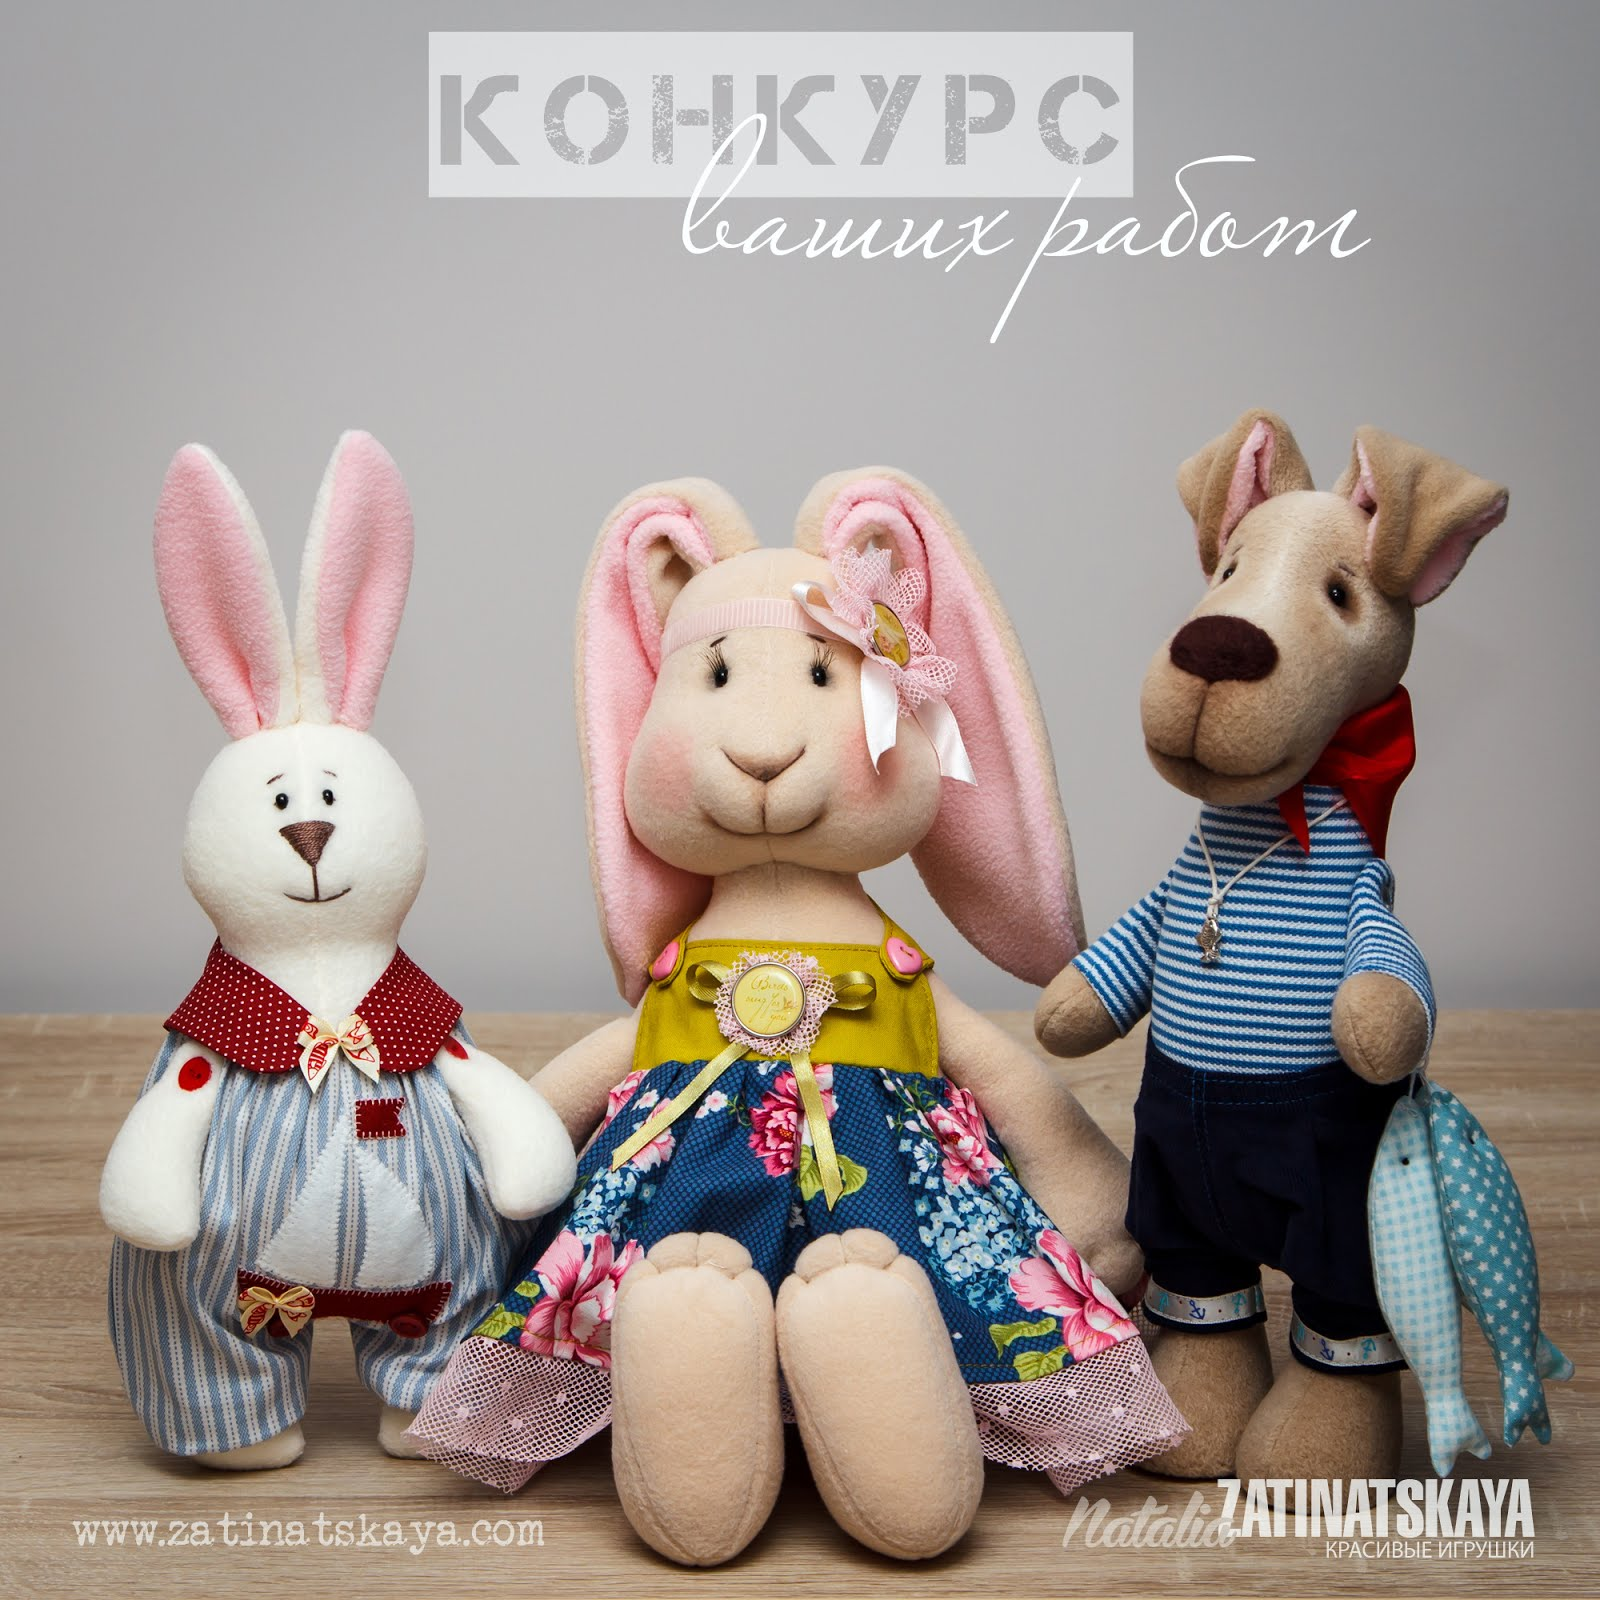 http://www.zatinatskaya.com/2014/06/handmade-konkurs.html